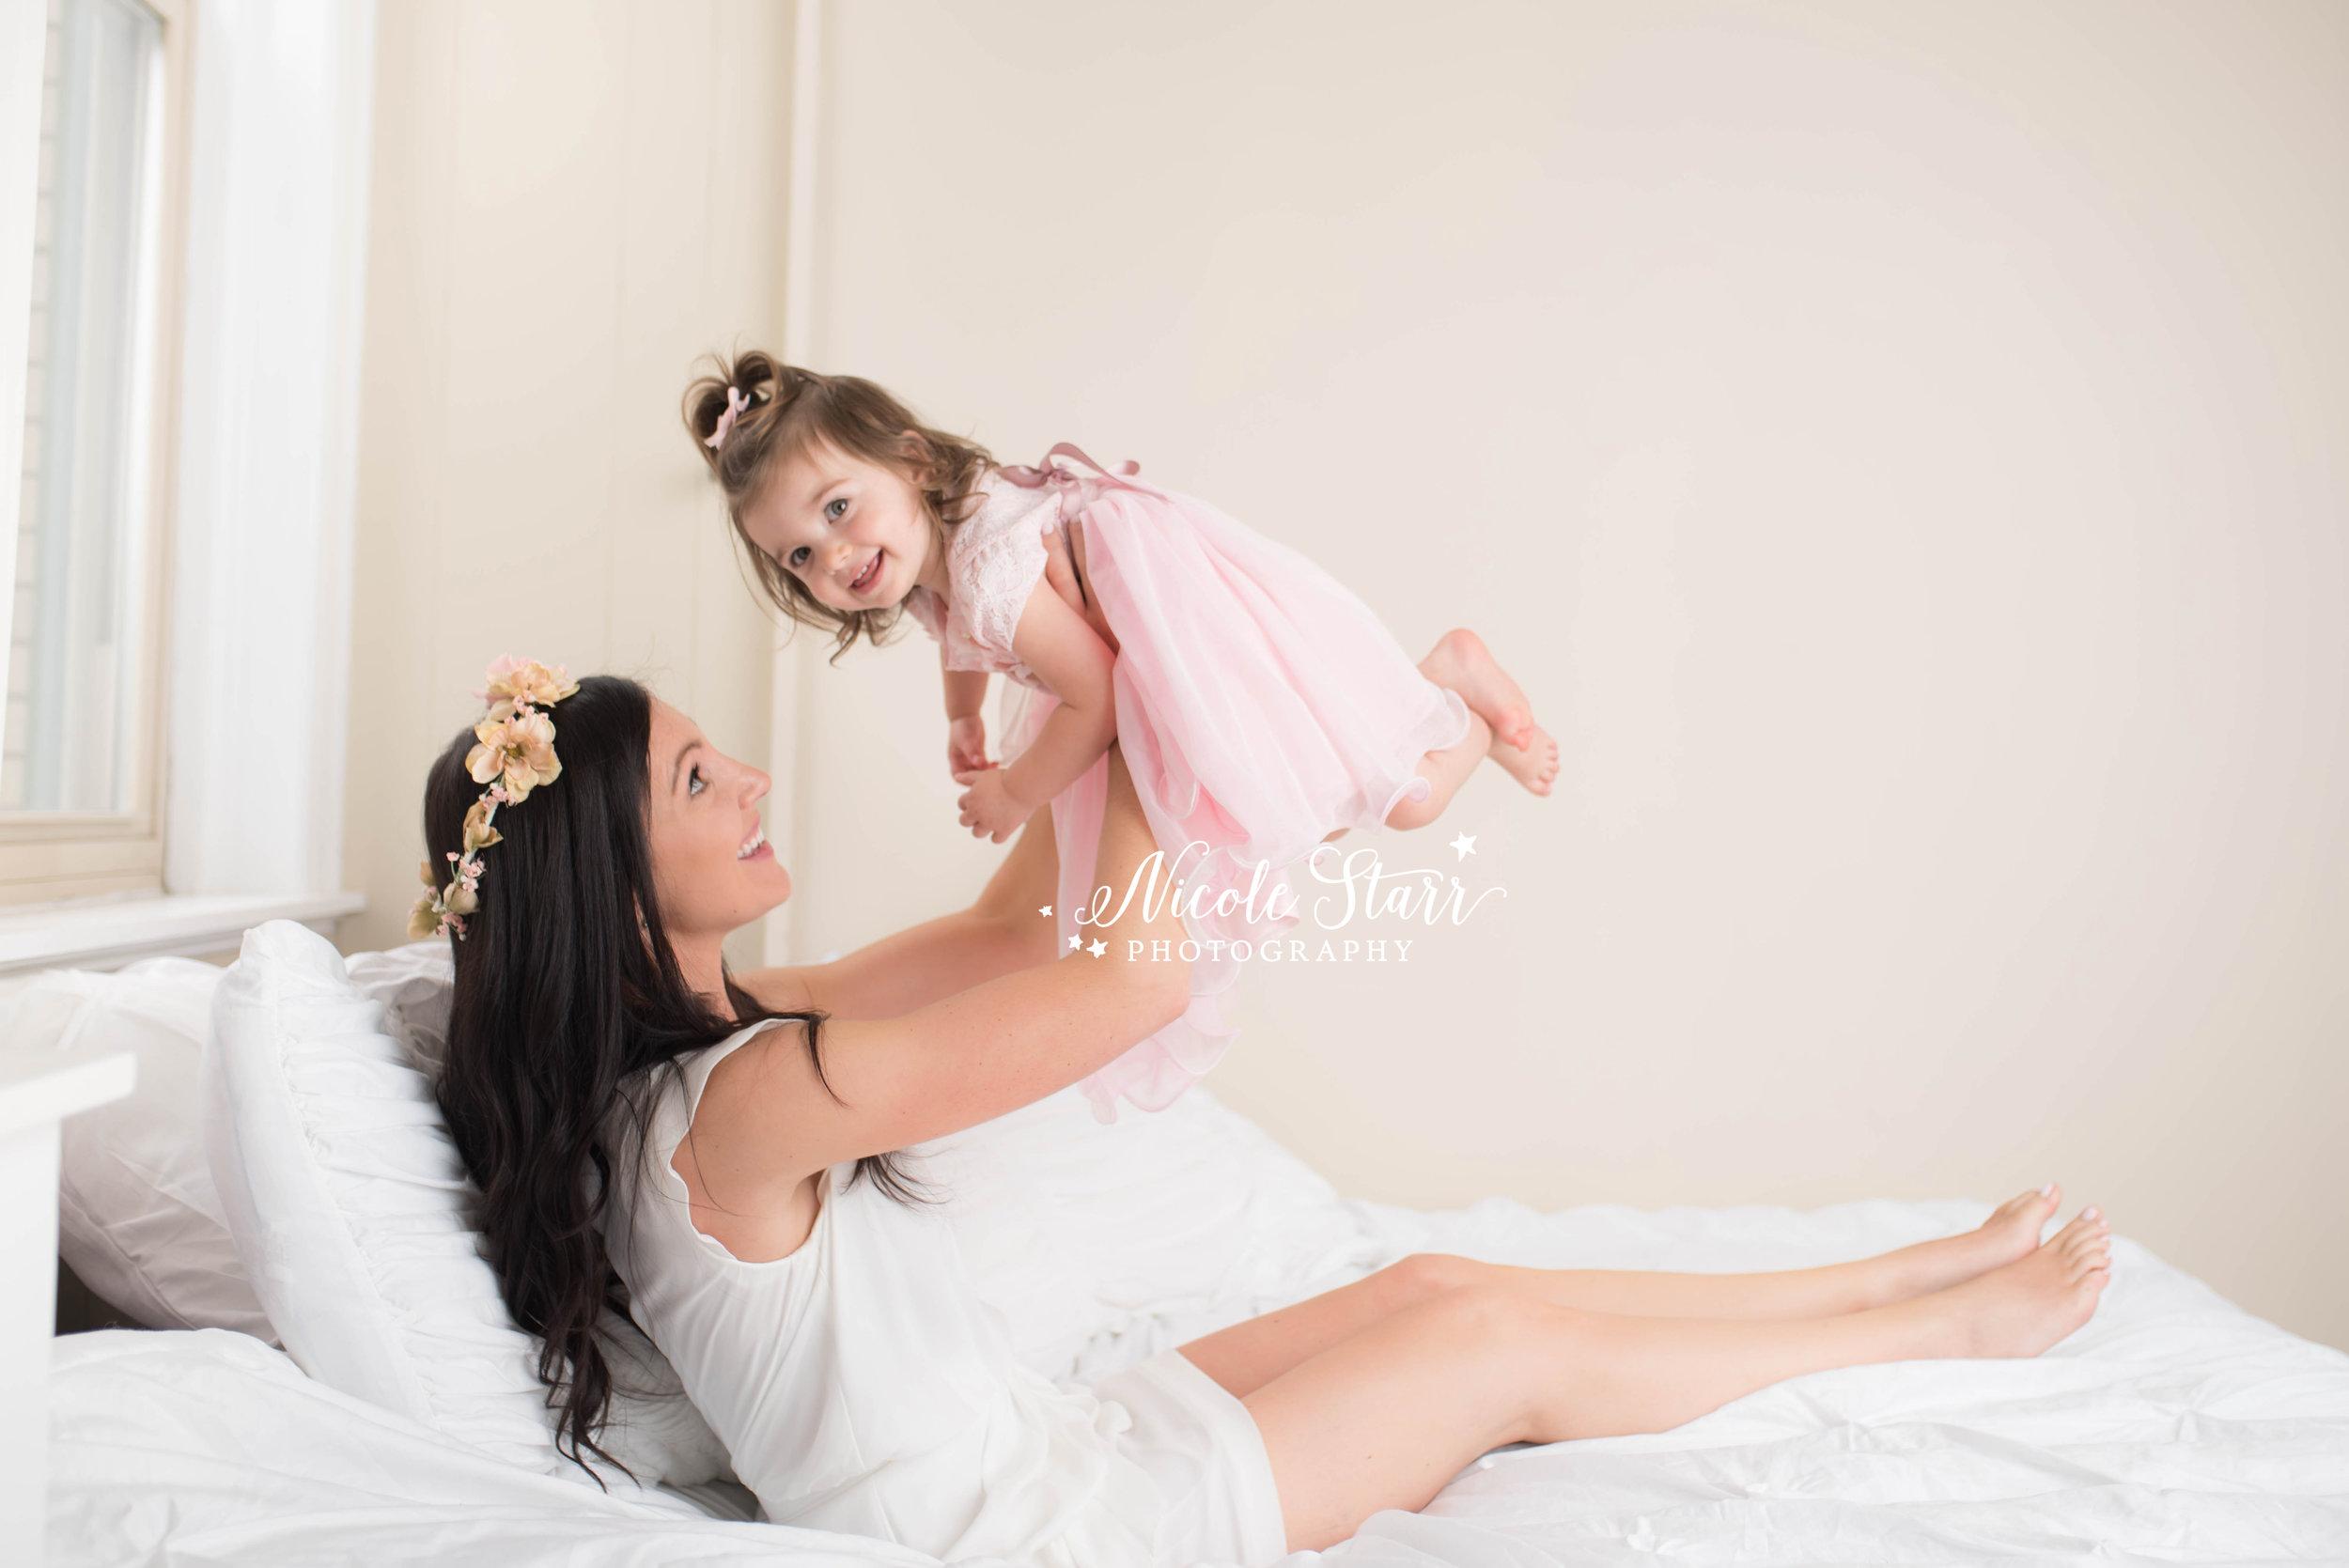 Nicole Starr Photography   Saratoga Springs Family Photographer   Boston Family Photographer   Upstate NY Family Photographer   Family Photographer   Motherhood Photographer